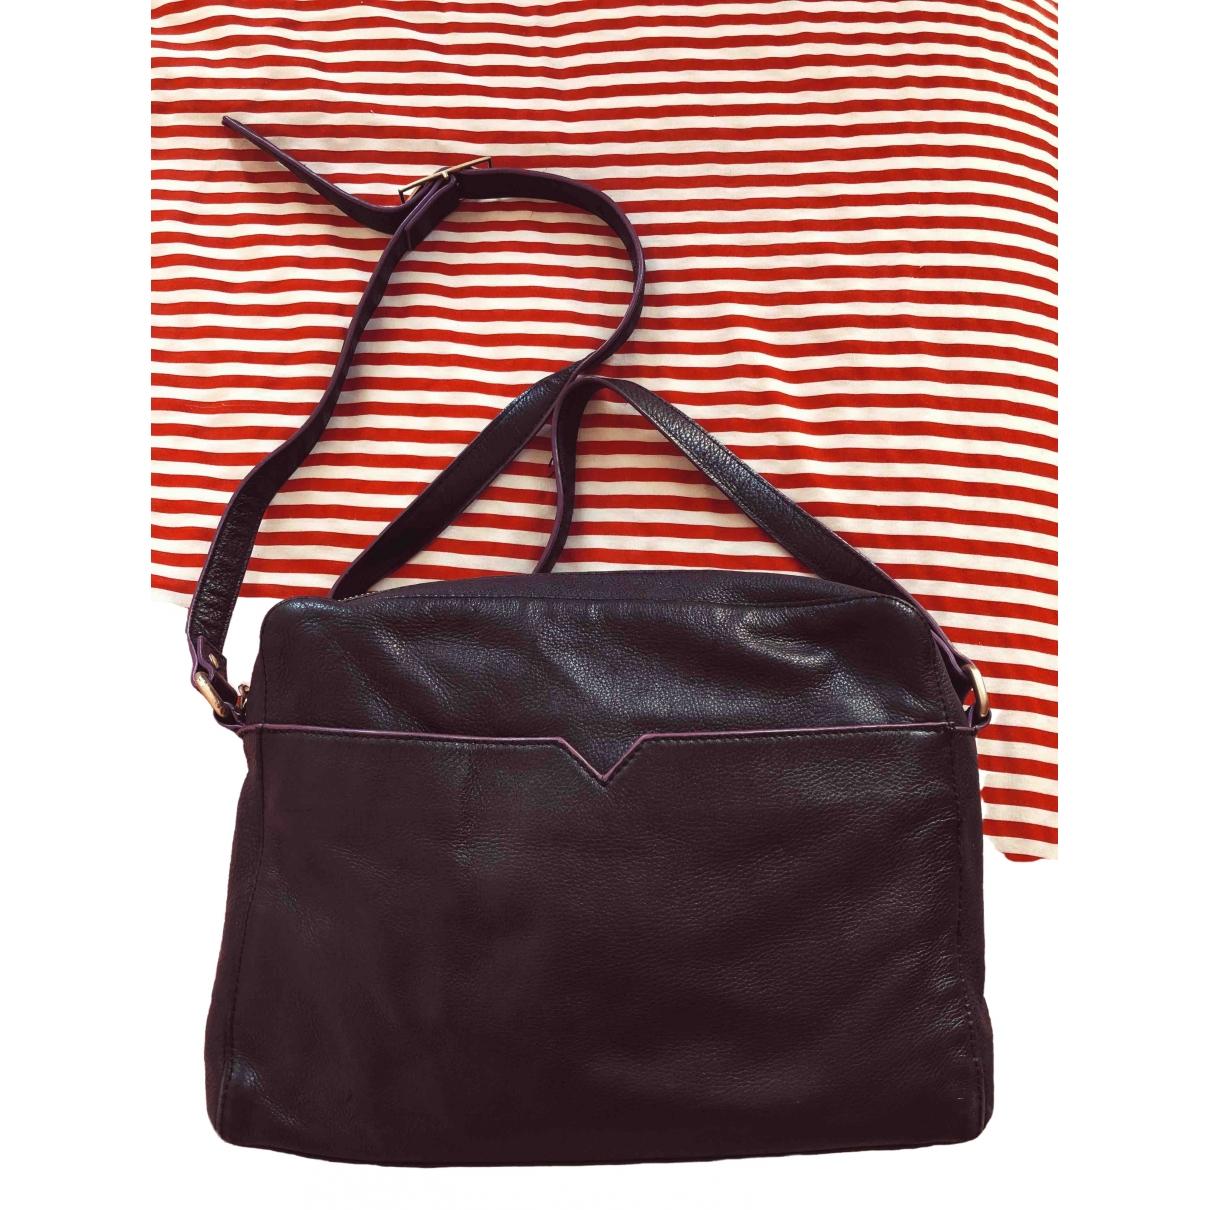 & Stories \N Black Leather handbag for Women \N